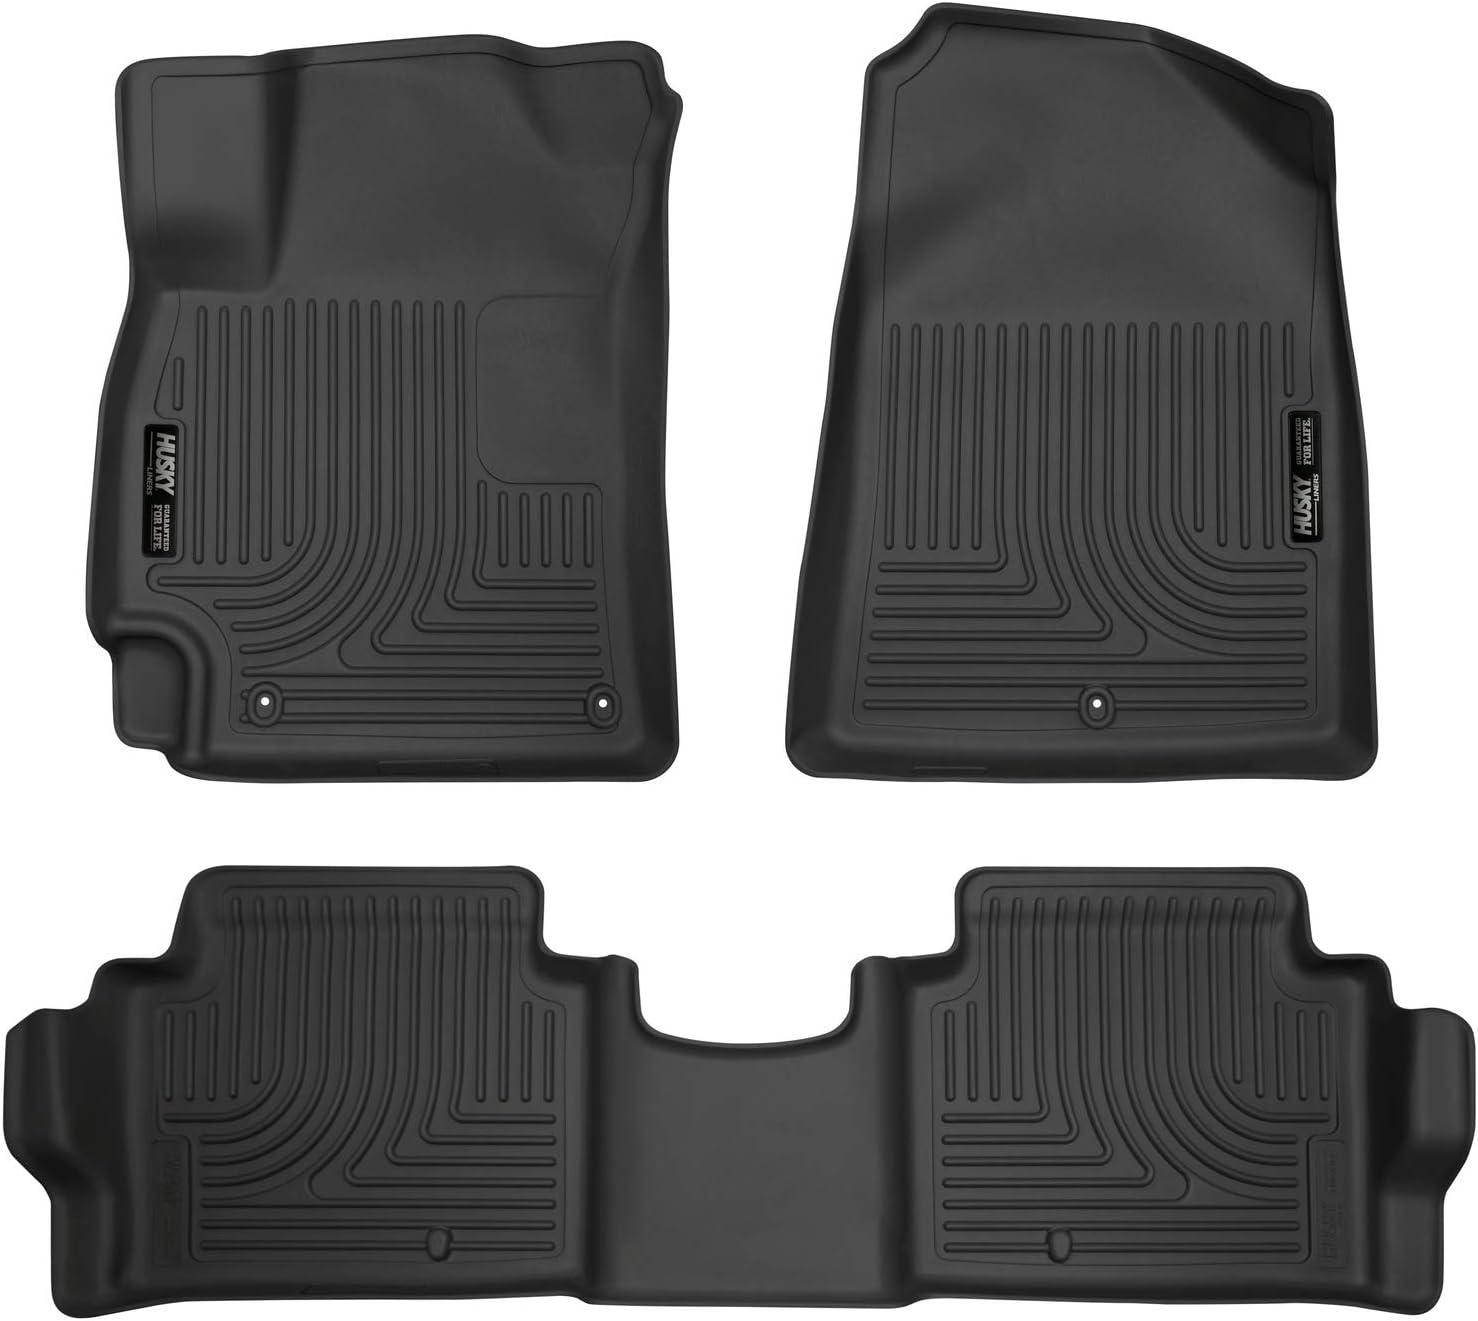 CFMAX1HI7019 Black Nylon Carpet Coverking Custom Fit Front Floor Mats for Select Hyundai Elantra Models